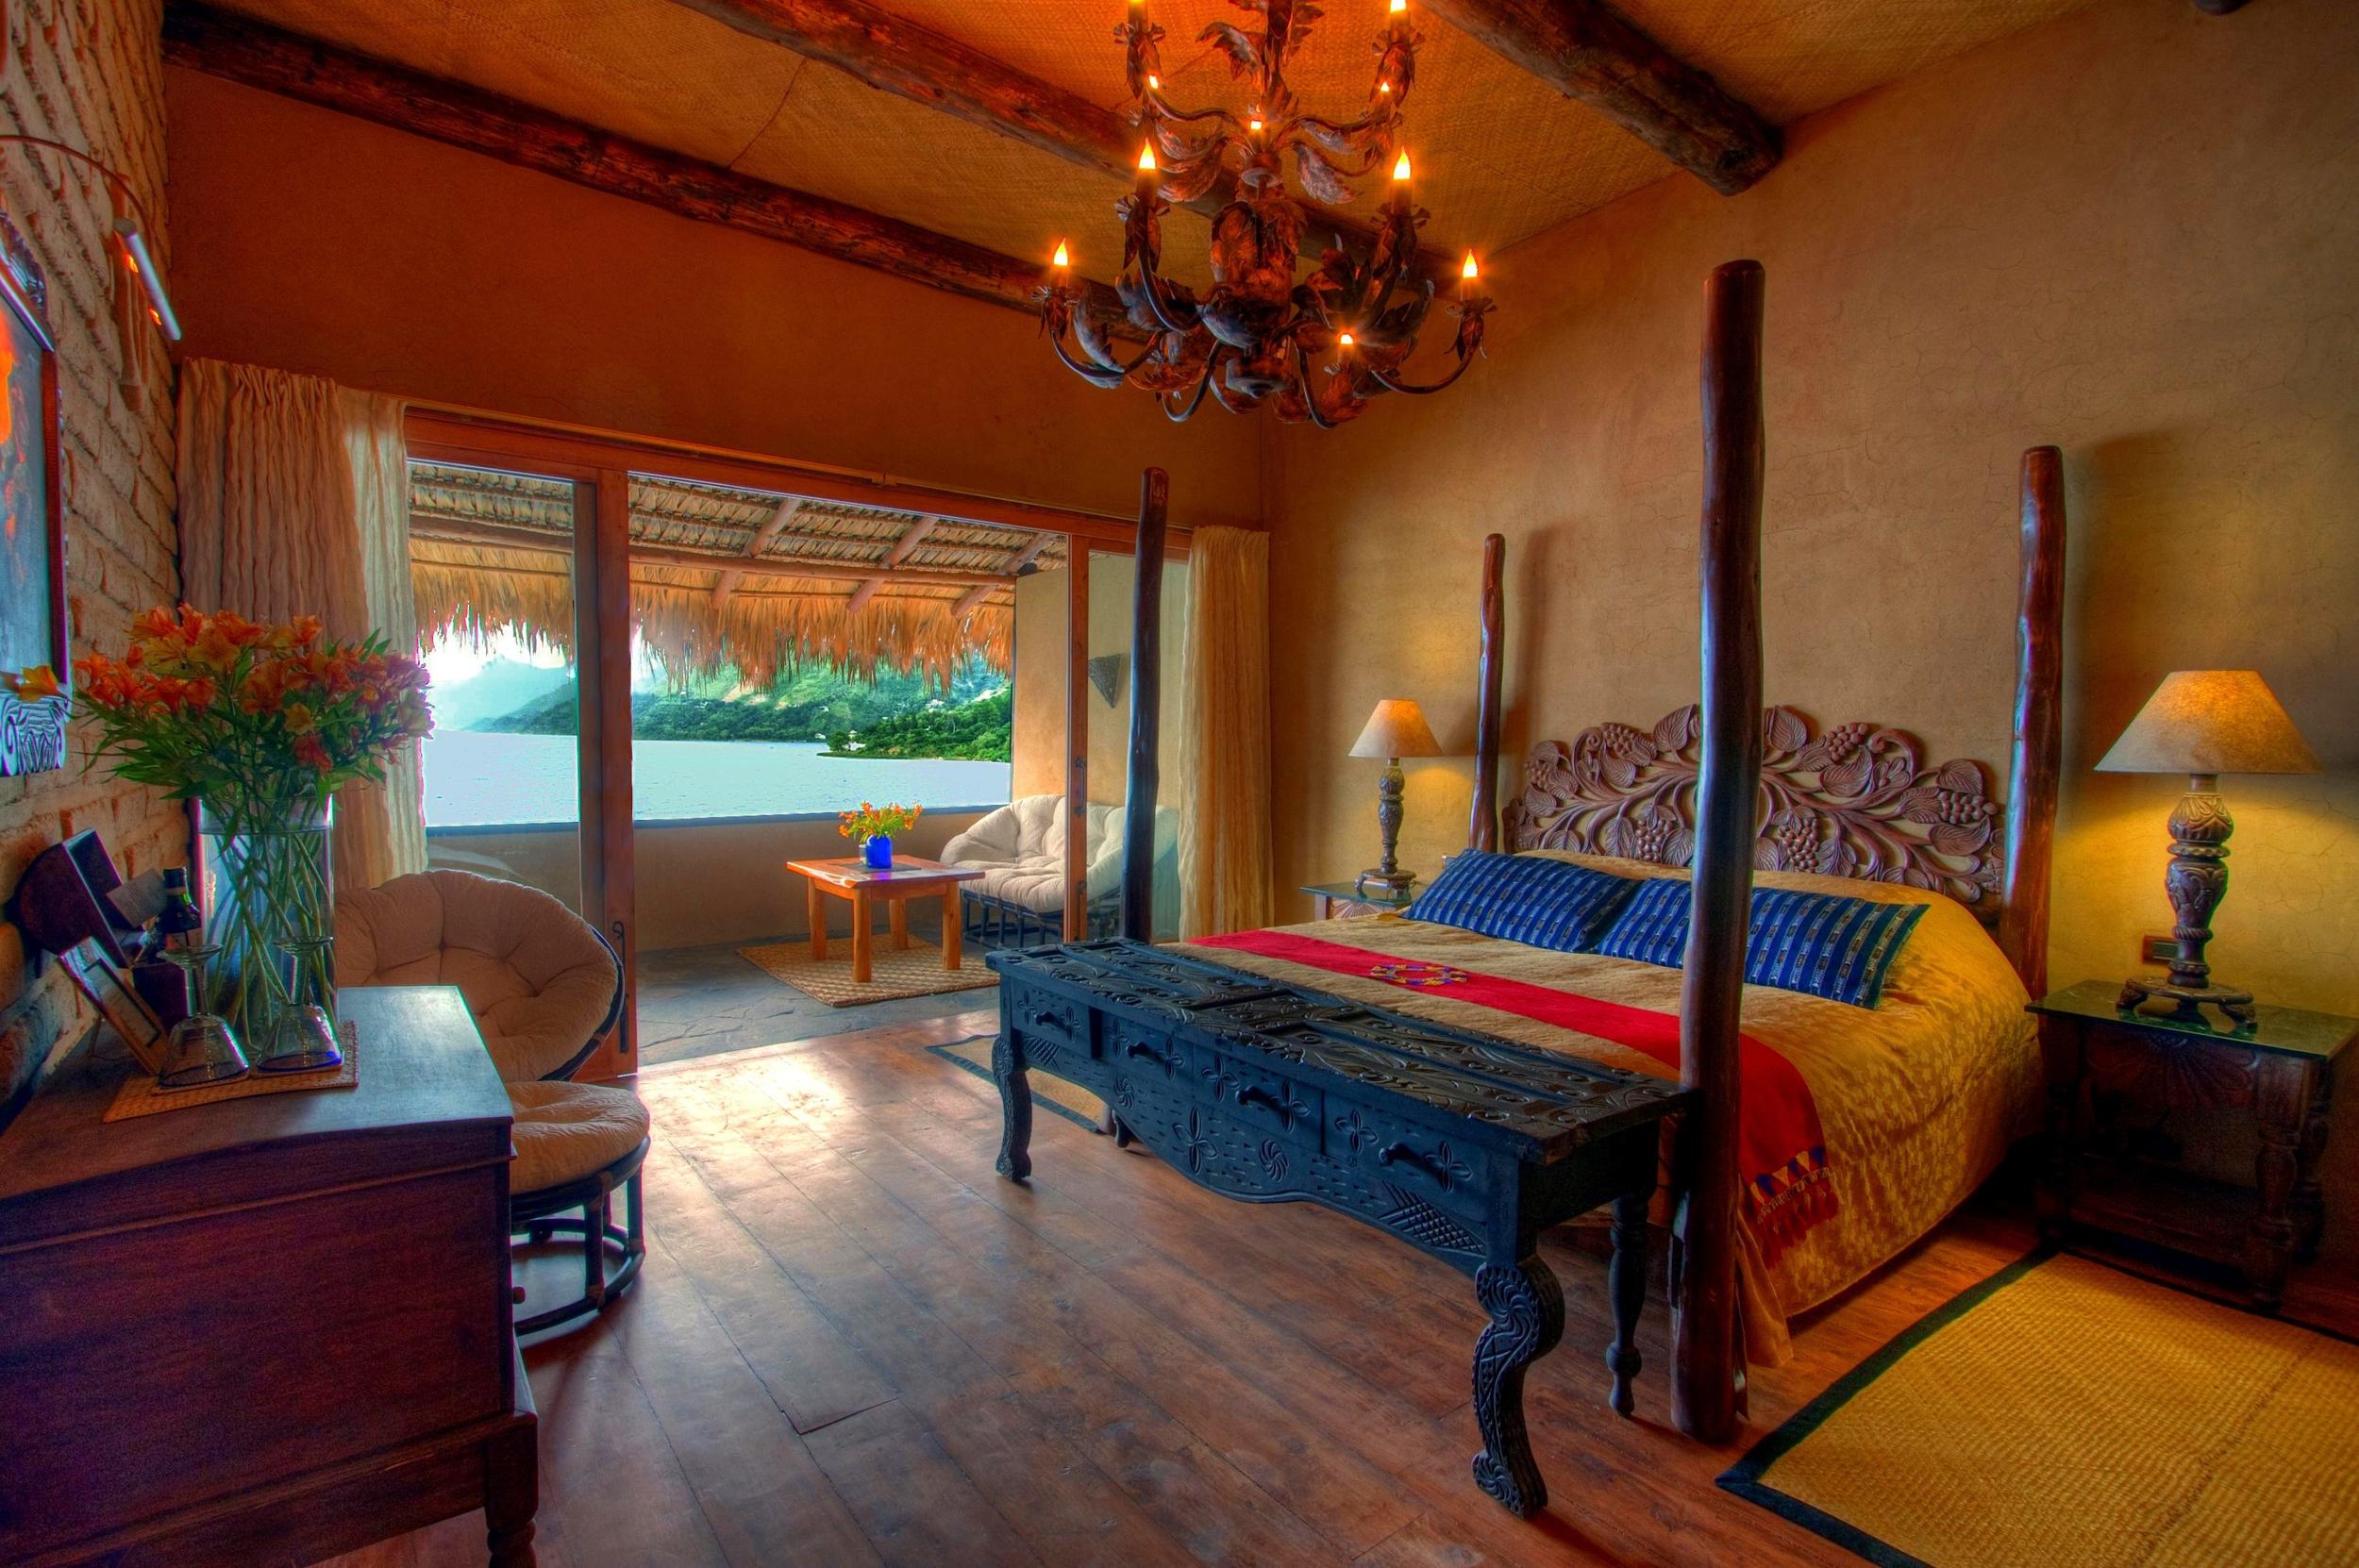 Jaguar Suite. Photo courtesy of Laguna Lodge.